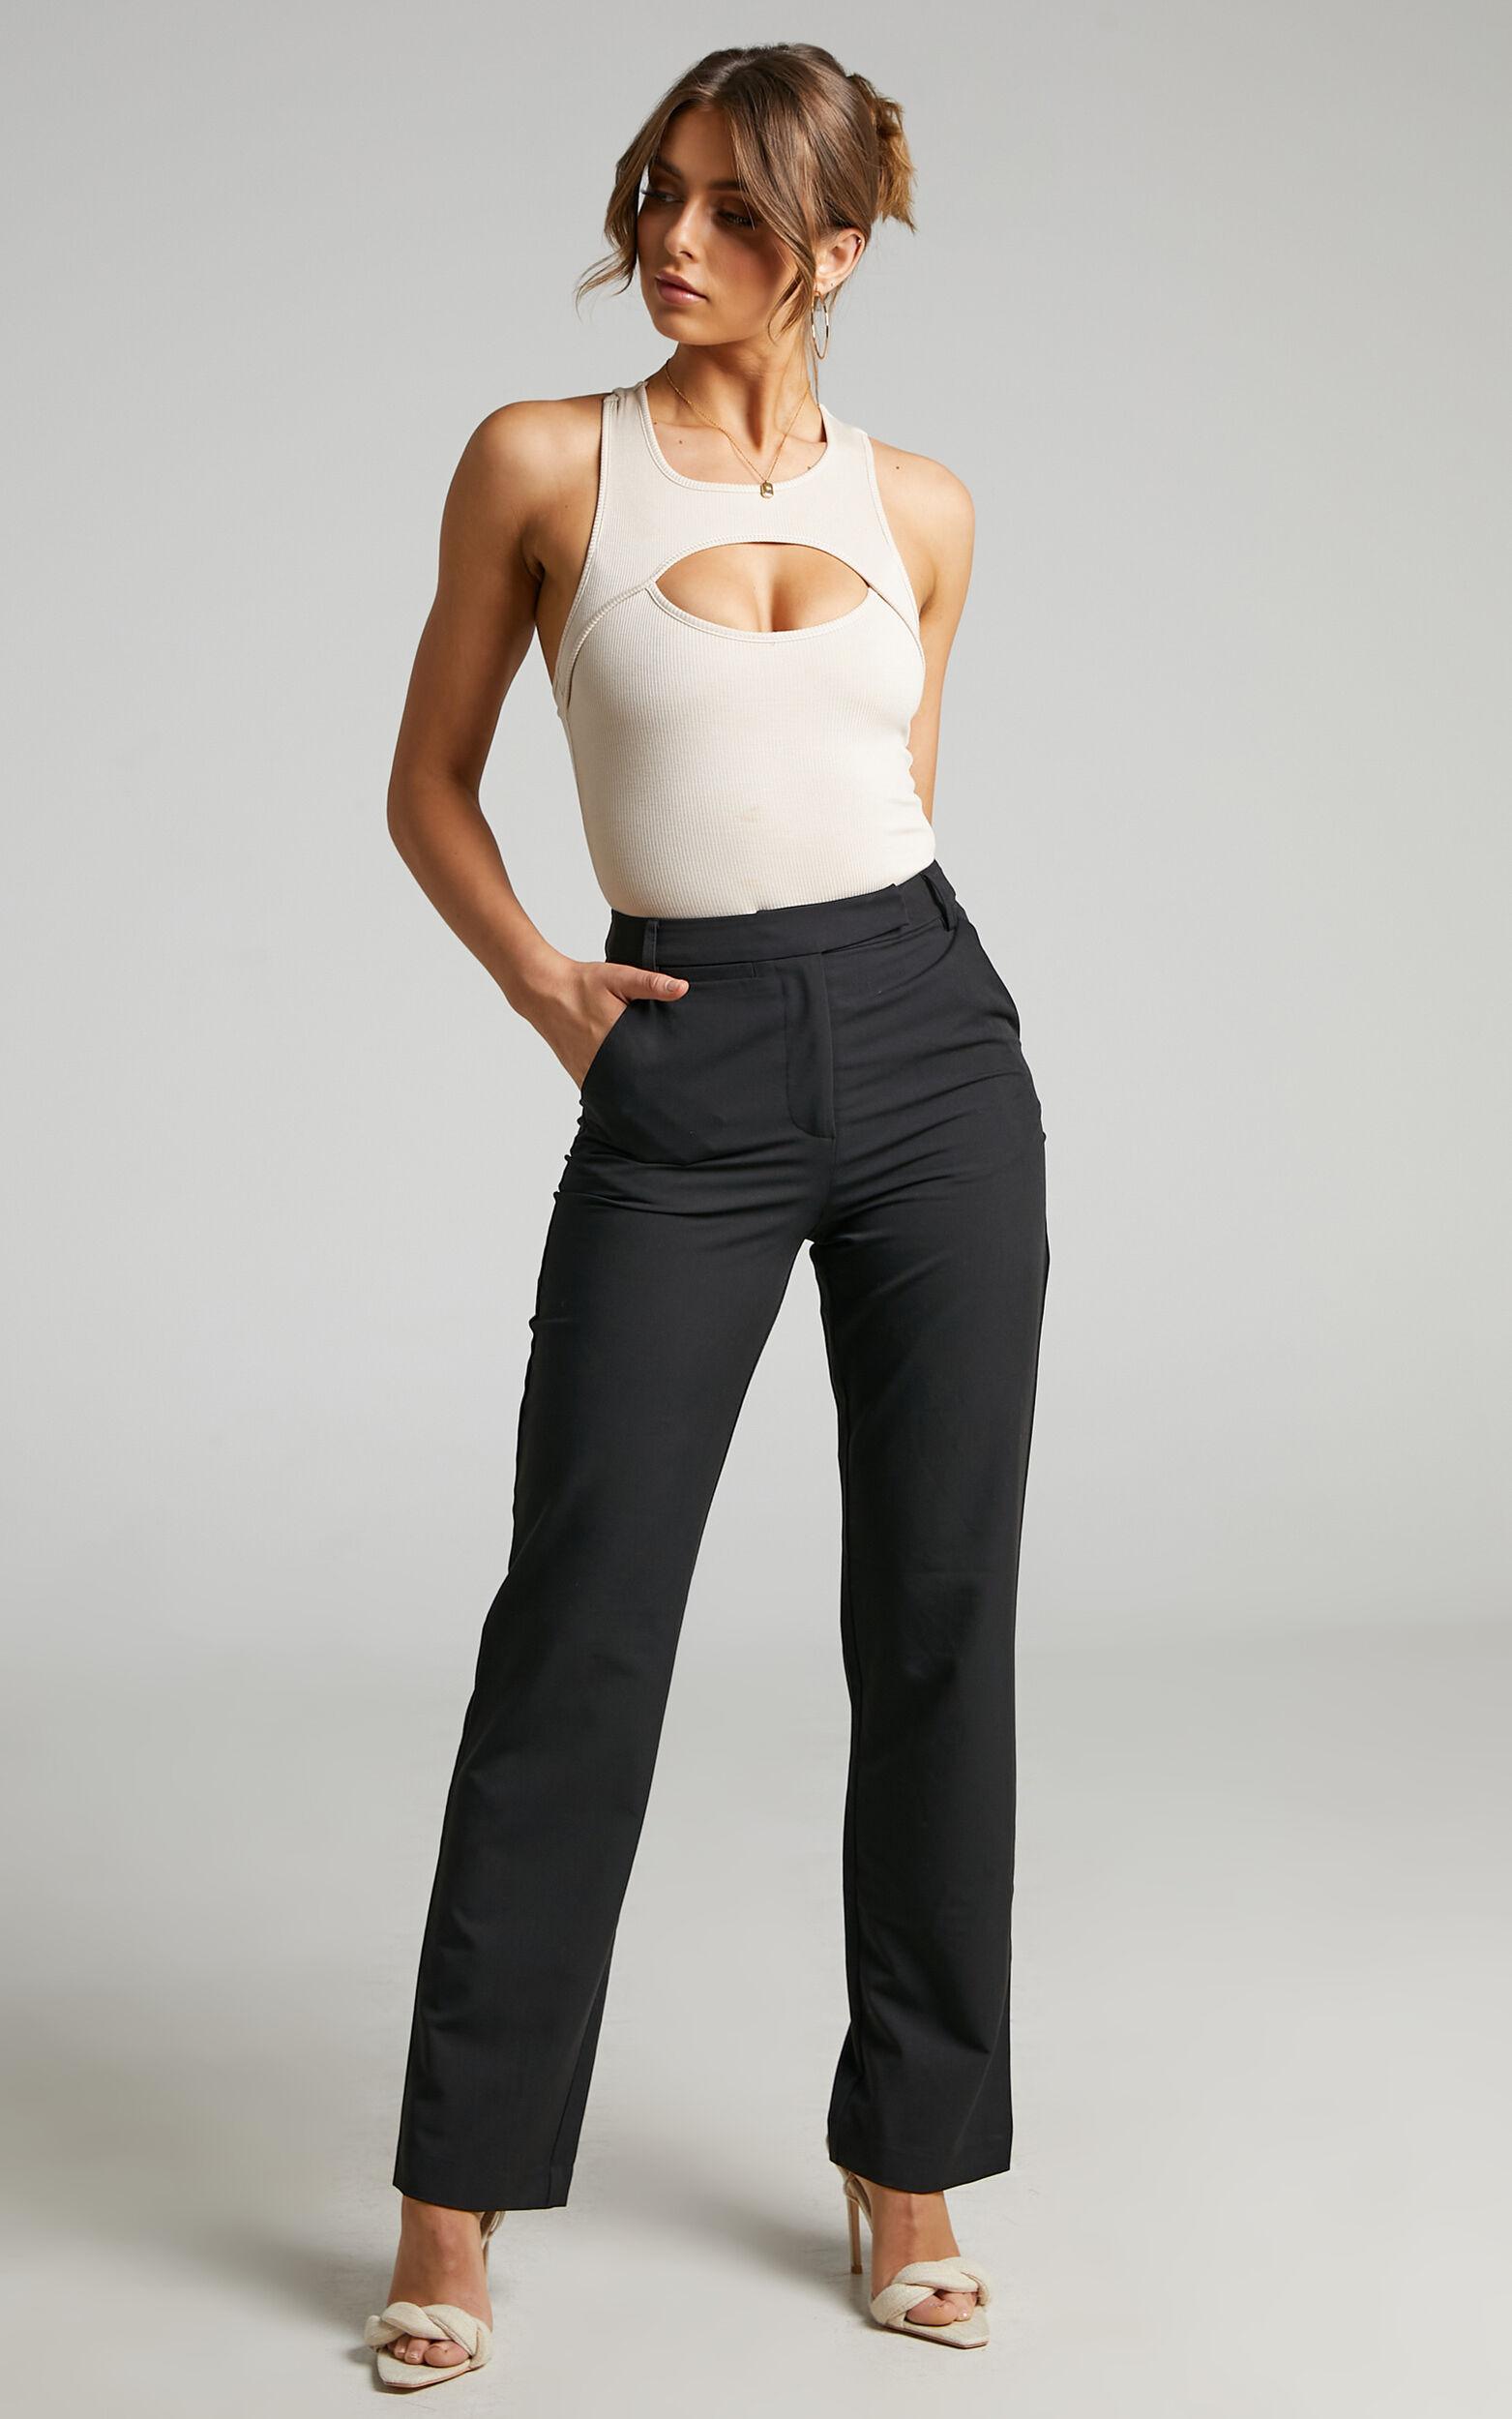 Ernez Tailored Straight Pants in Black - 04, BLK1, super-hi-res image number null